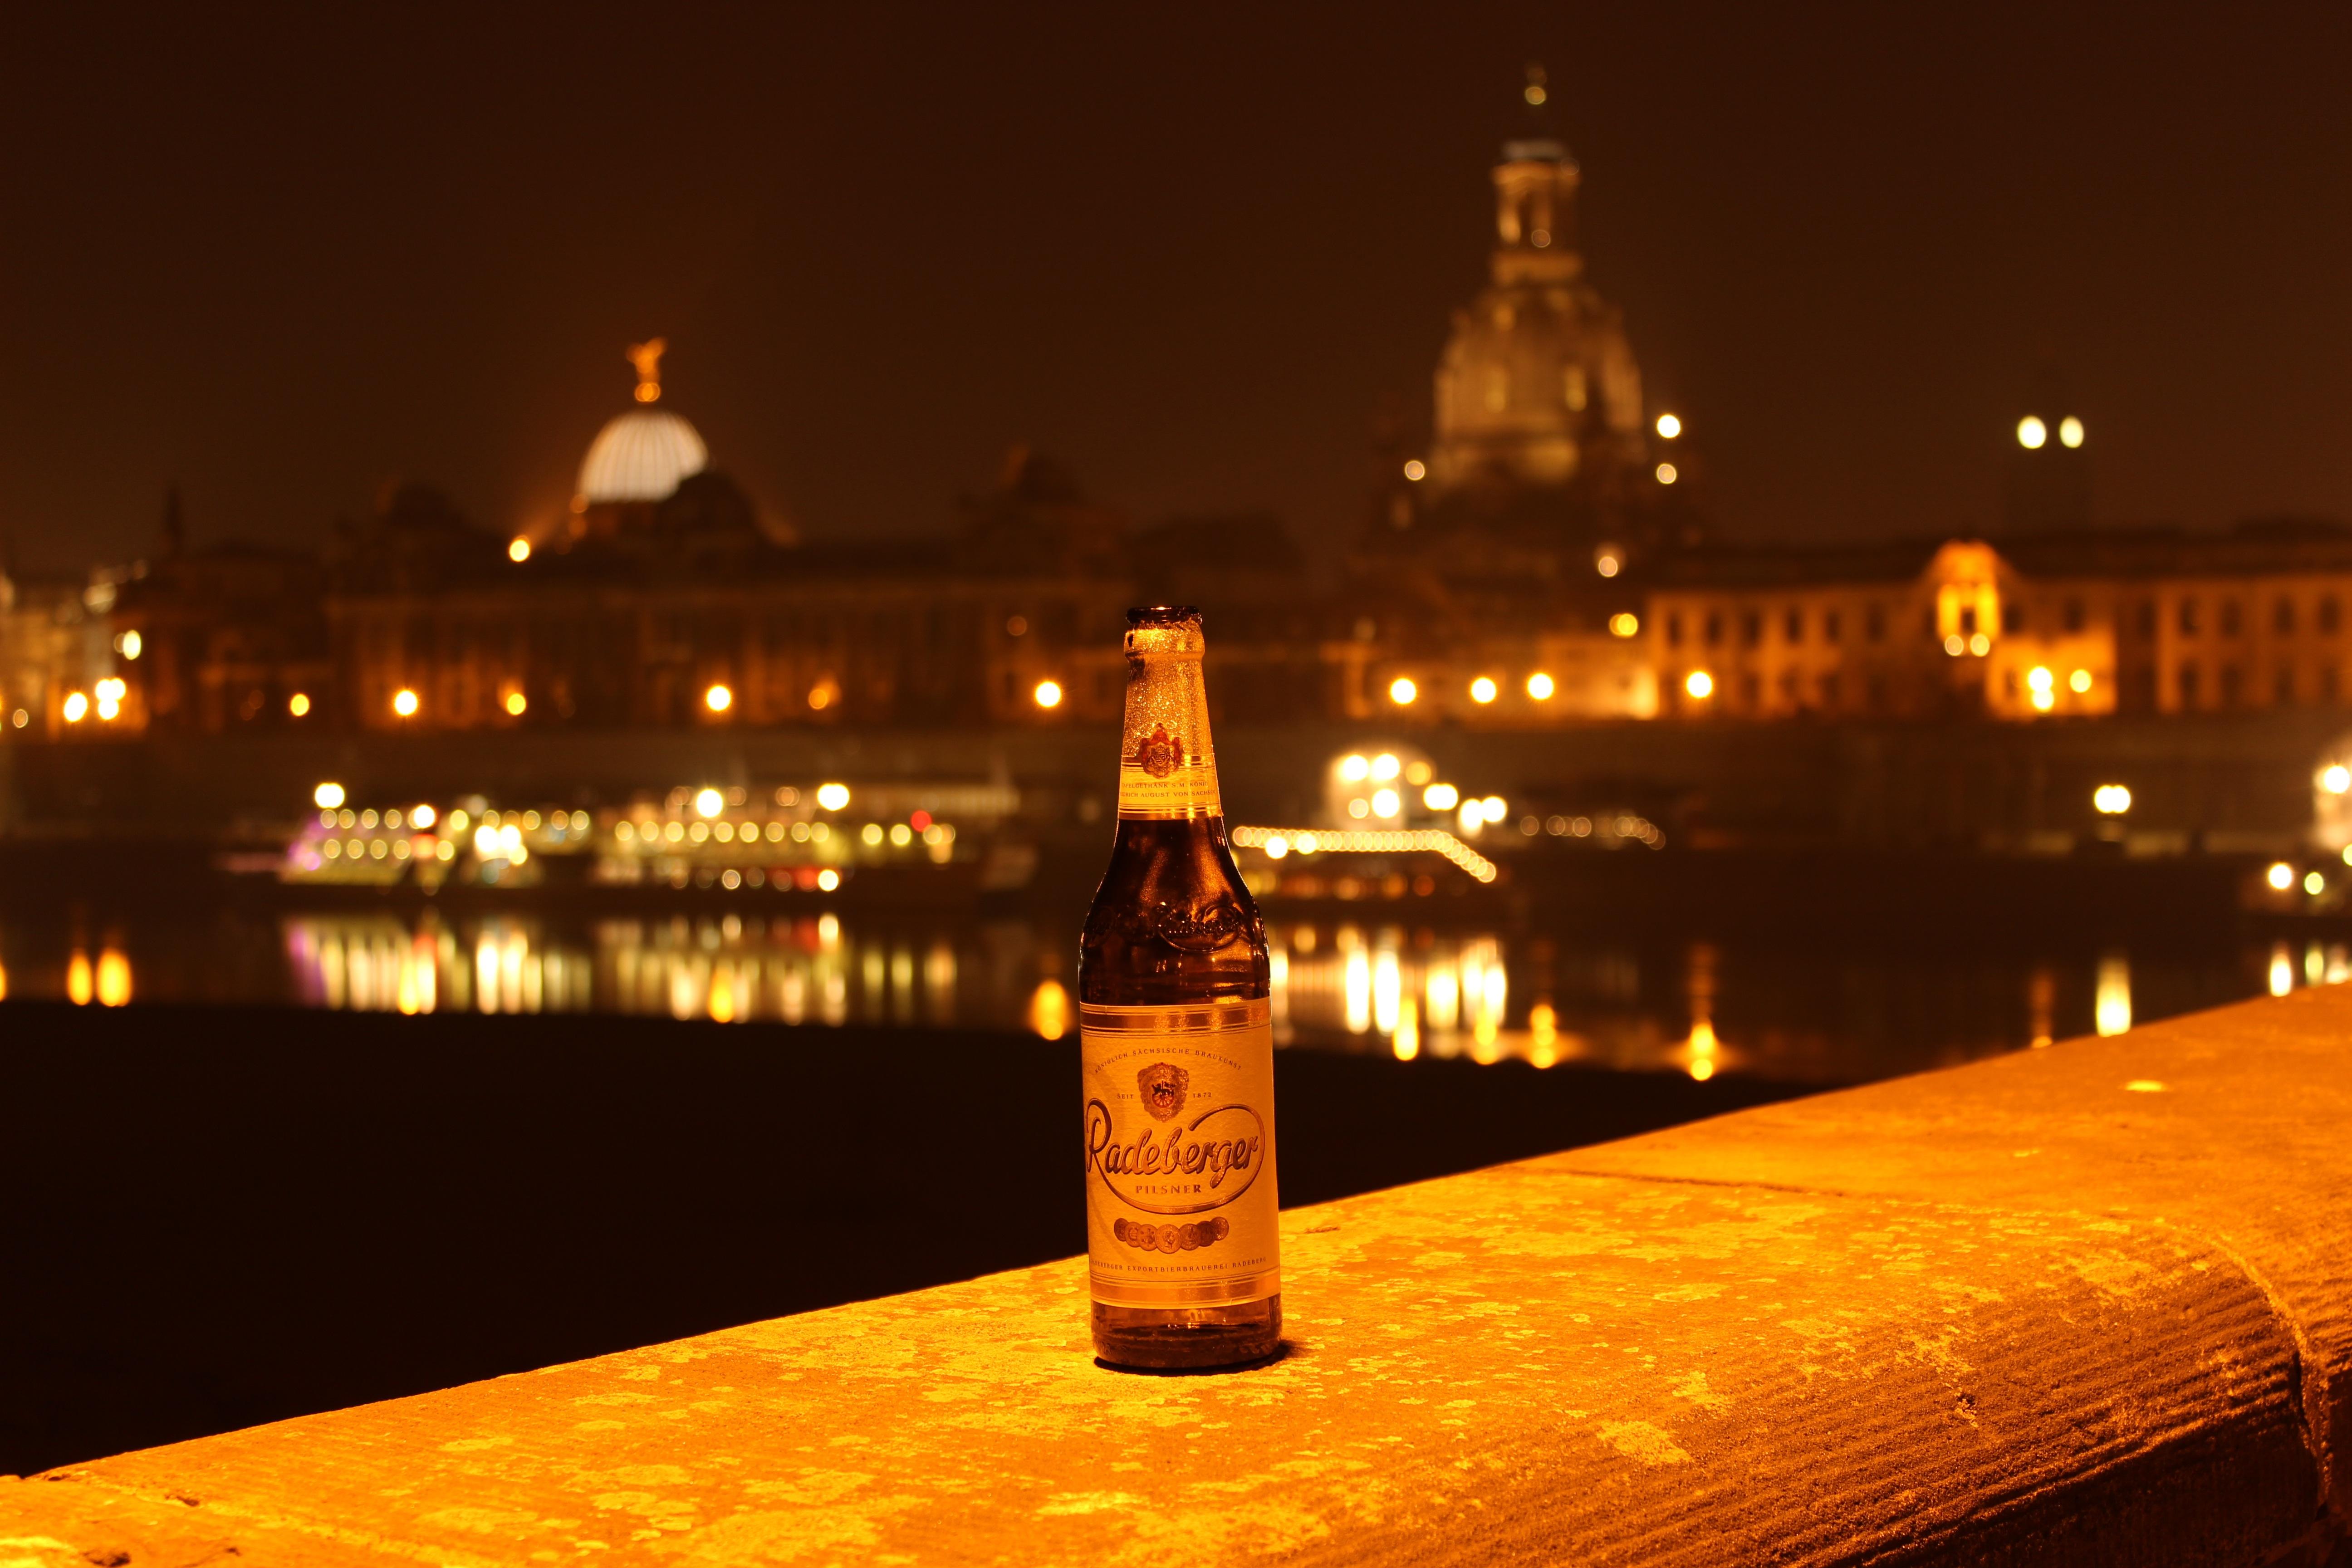 Gambar Cahaya Senja Refleksi Romantis Penerangan Pemandangan